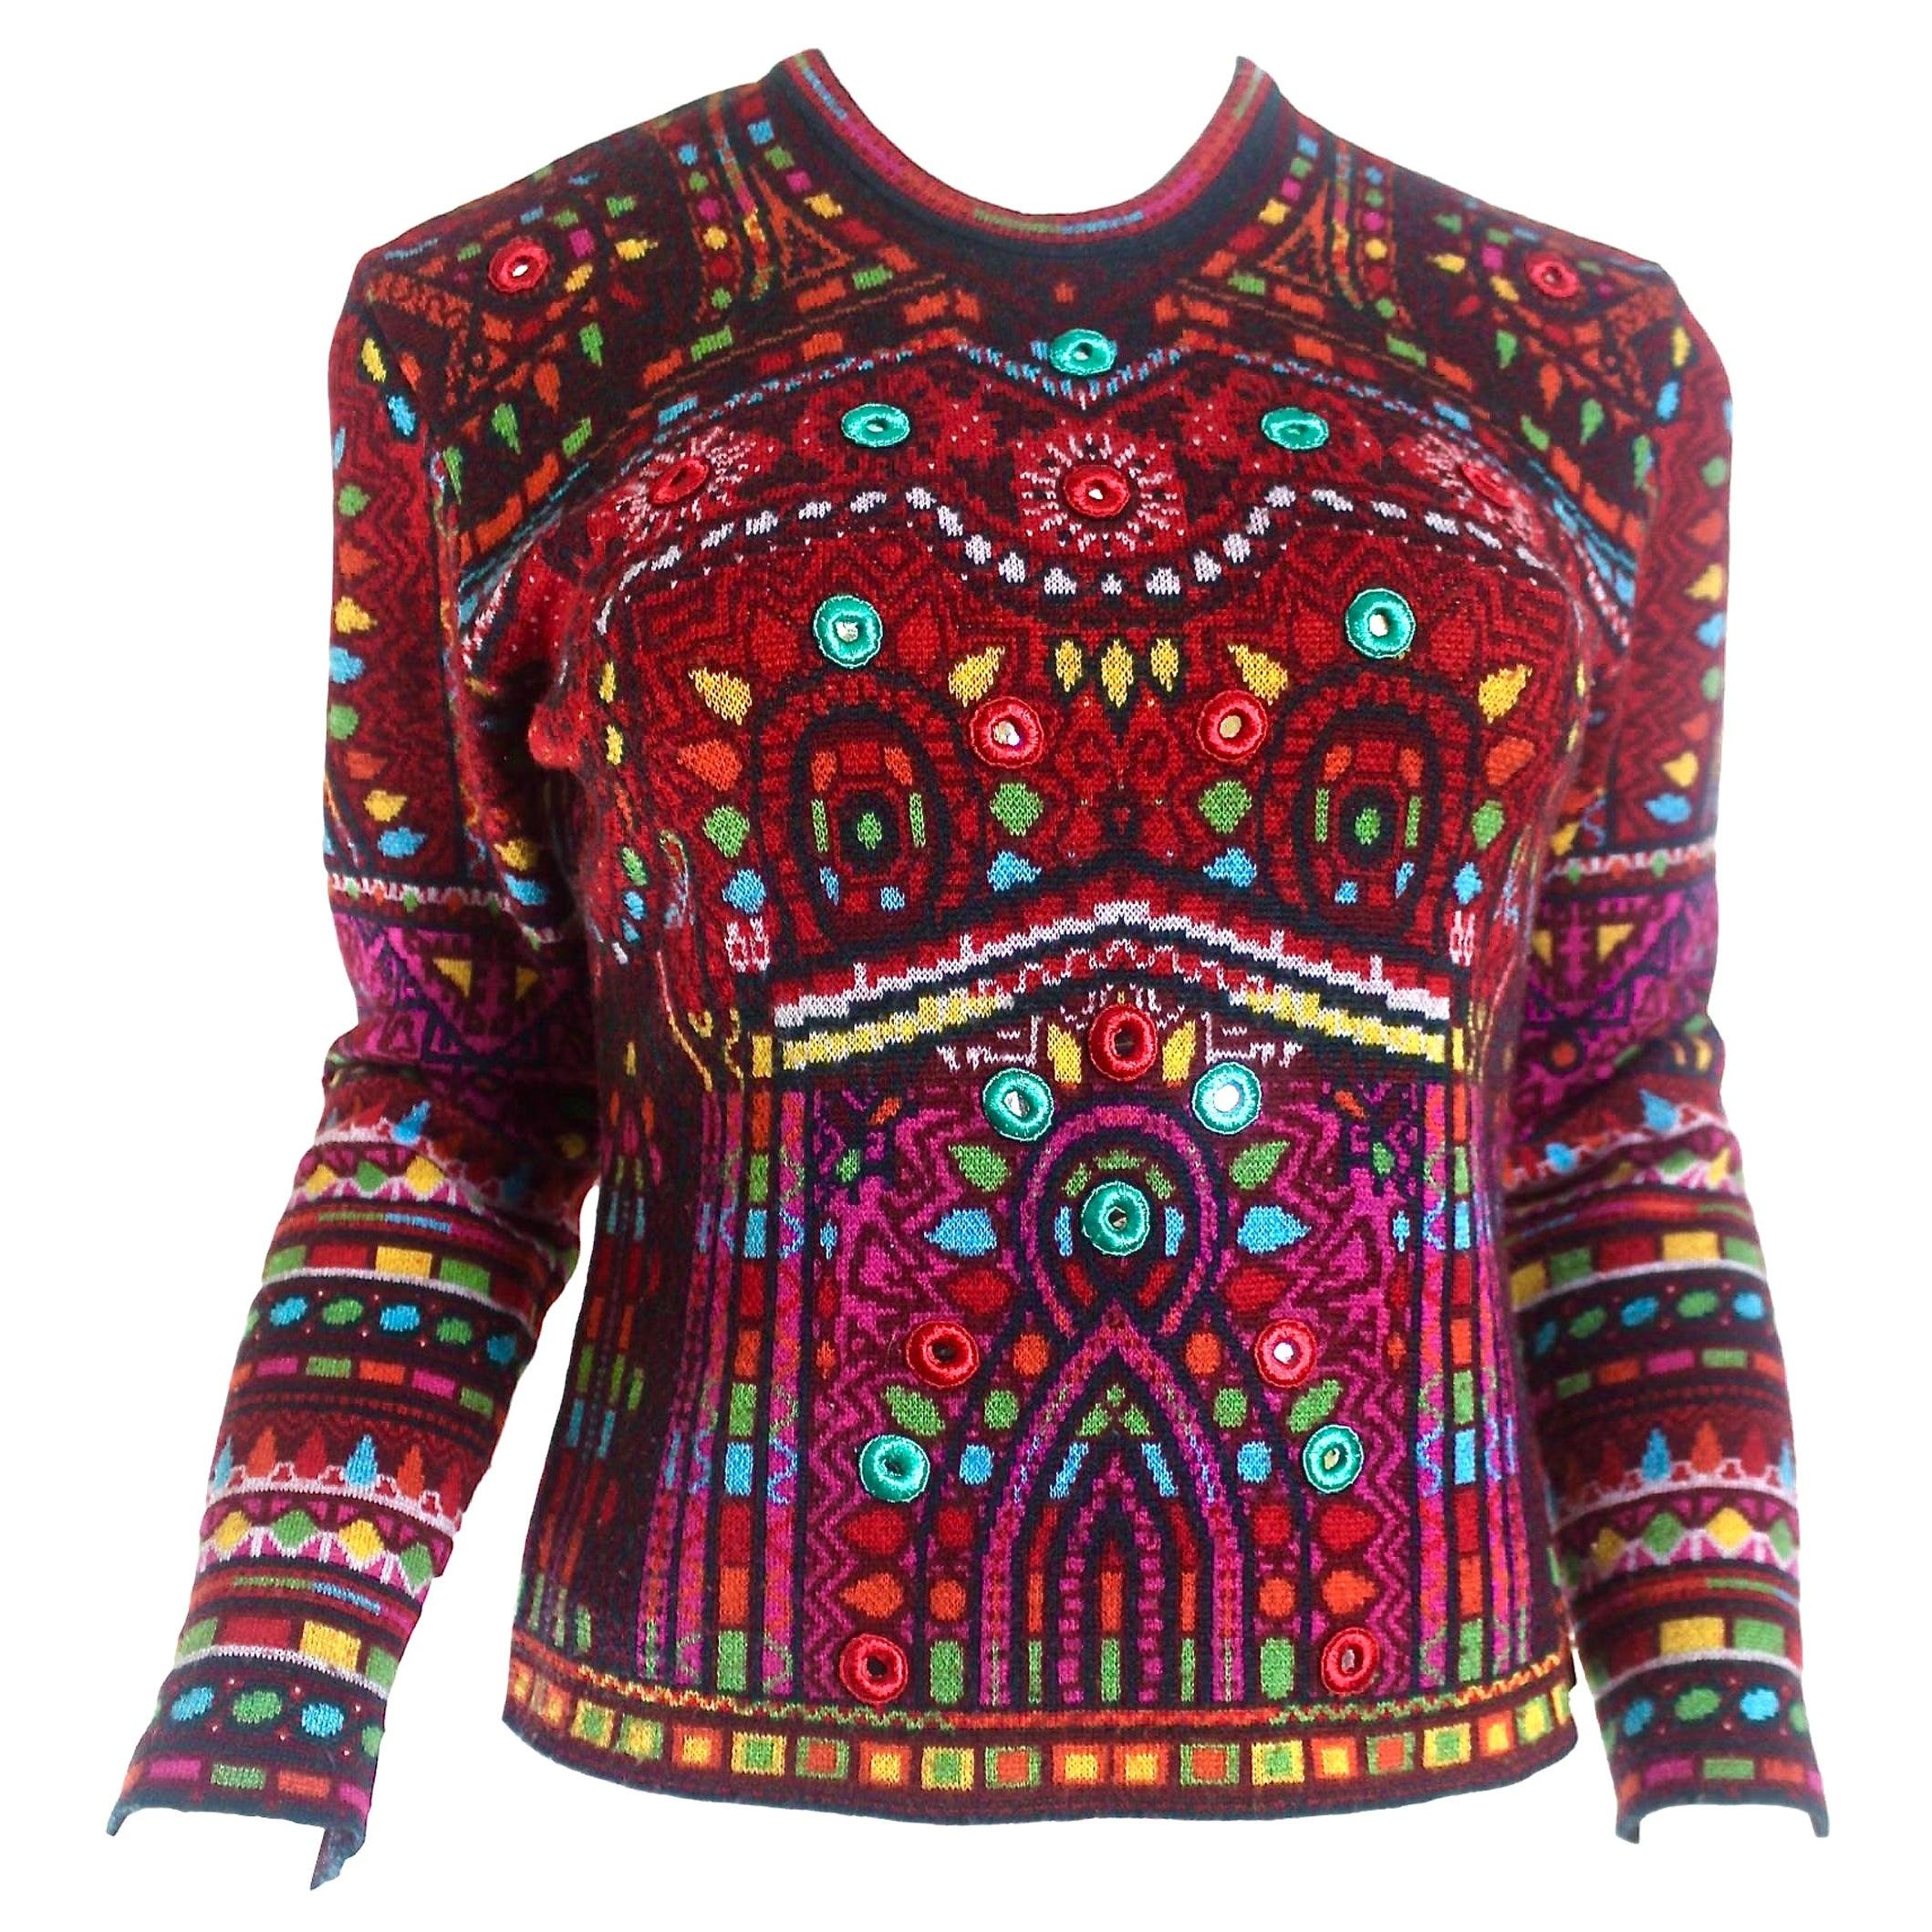 Kenzo Elaborate Indian Patterned Sweater with Sisha Mirror Decoration